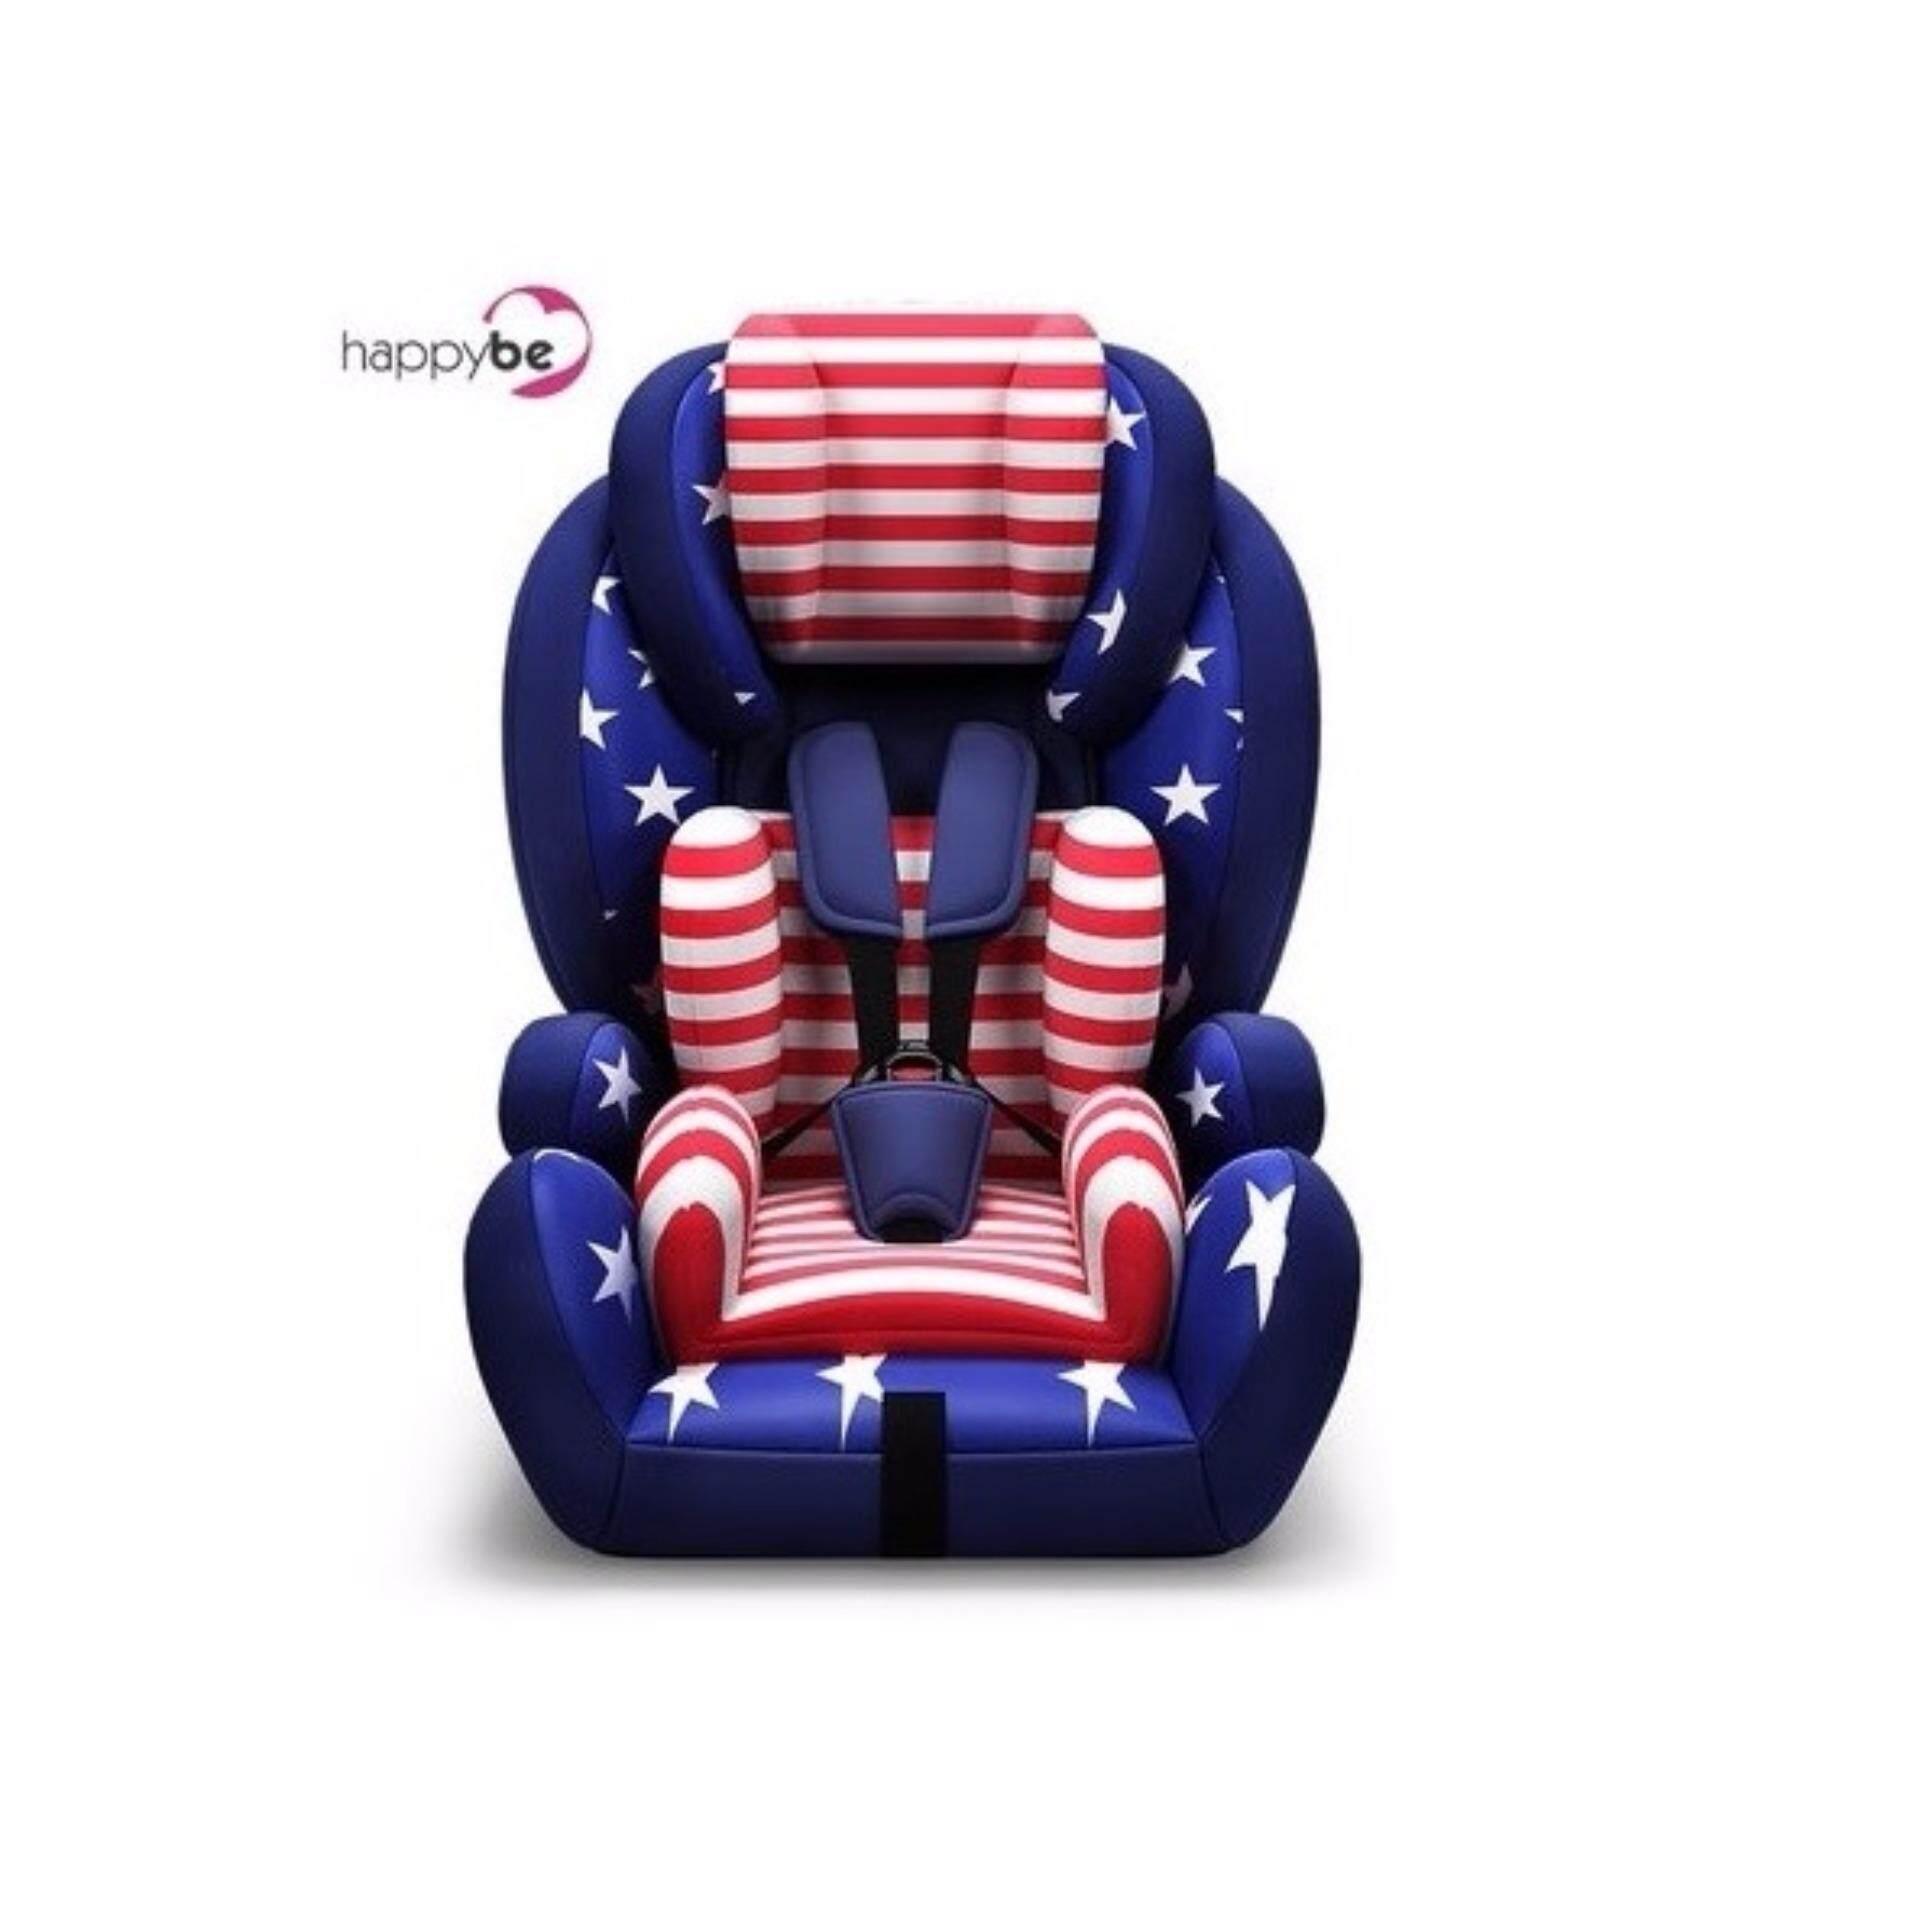 [BB17] Happybe Baby Car Seat